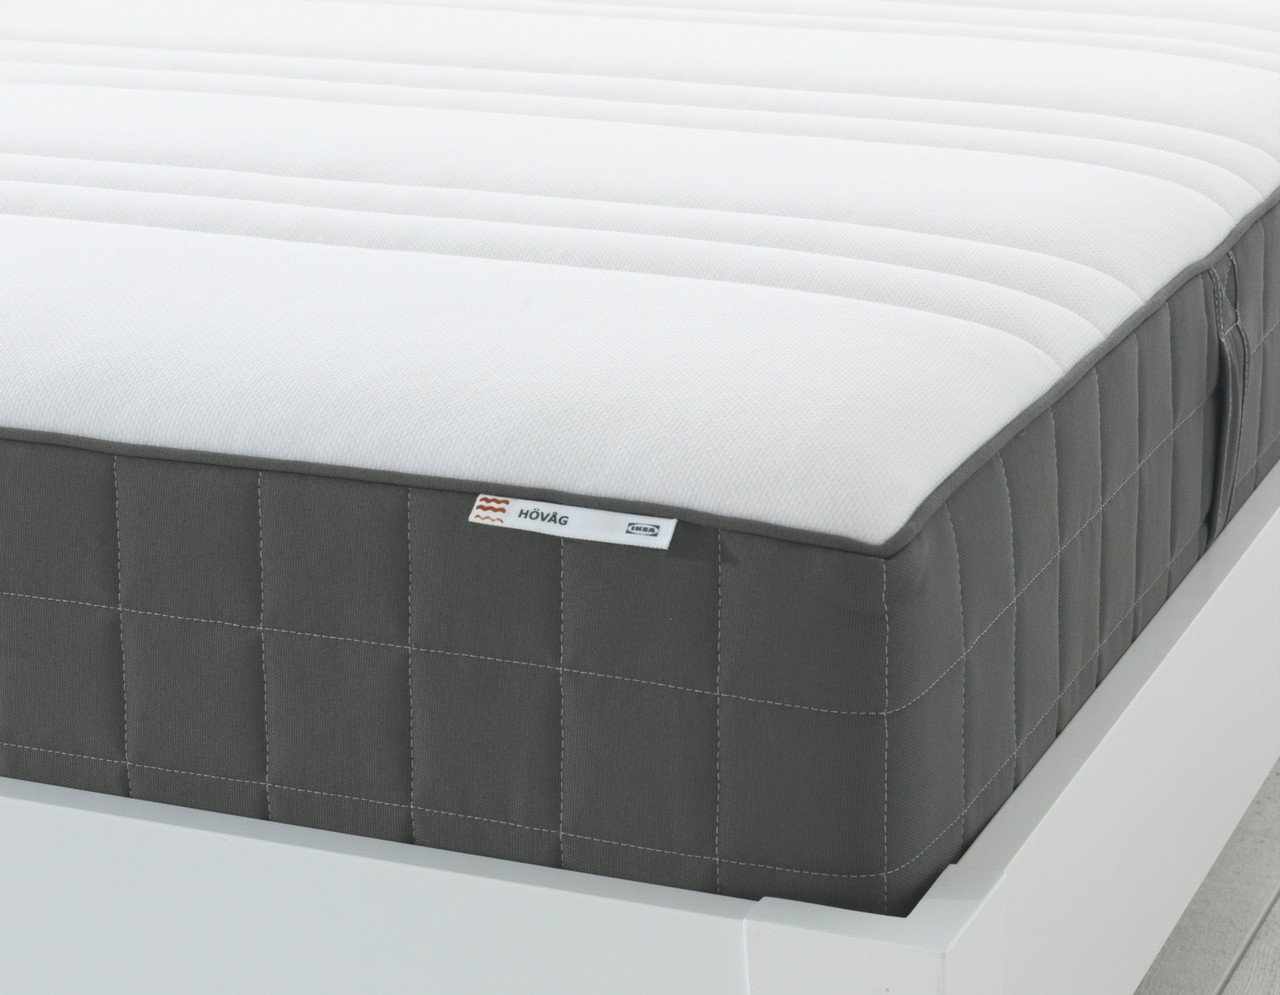 IKEA HÖVÅG獨立筒彈簧床墊(深灰色),原價12,900元、特價8,990...